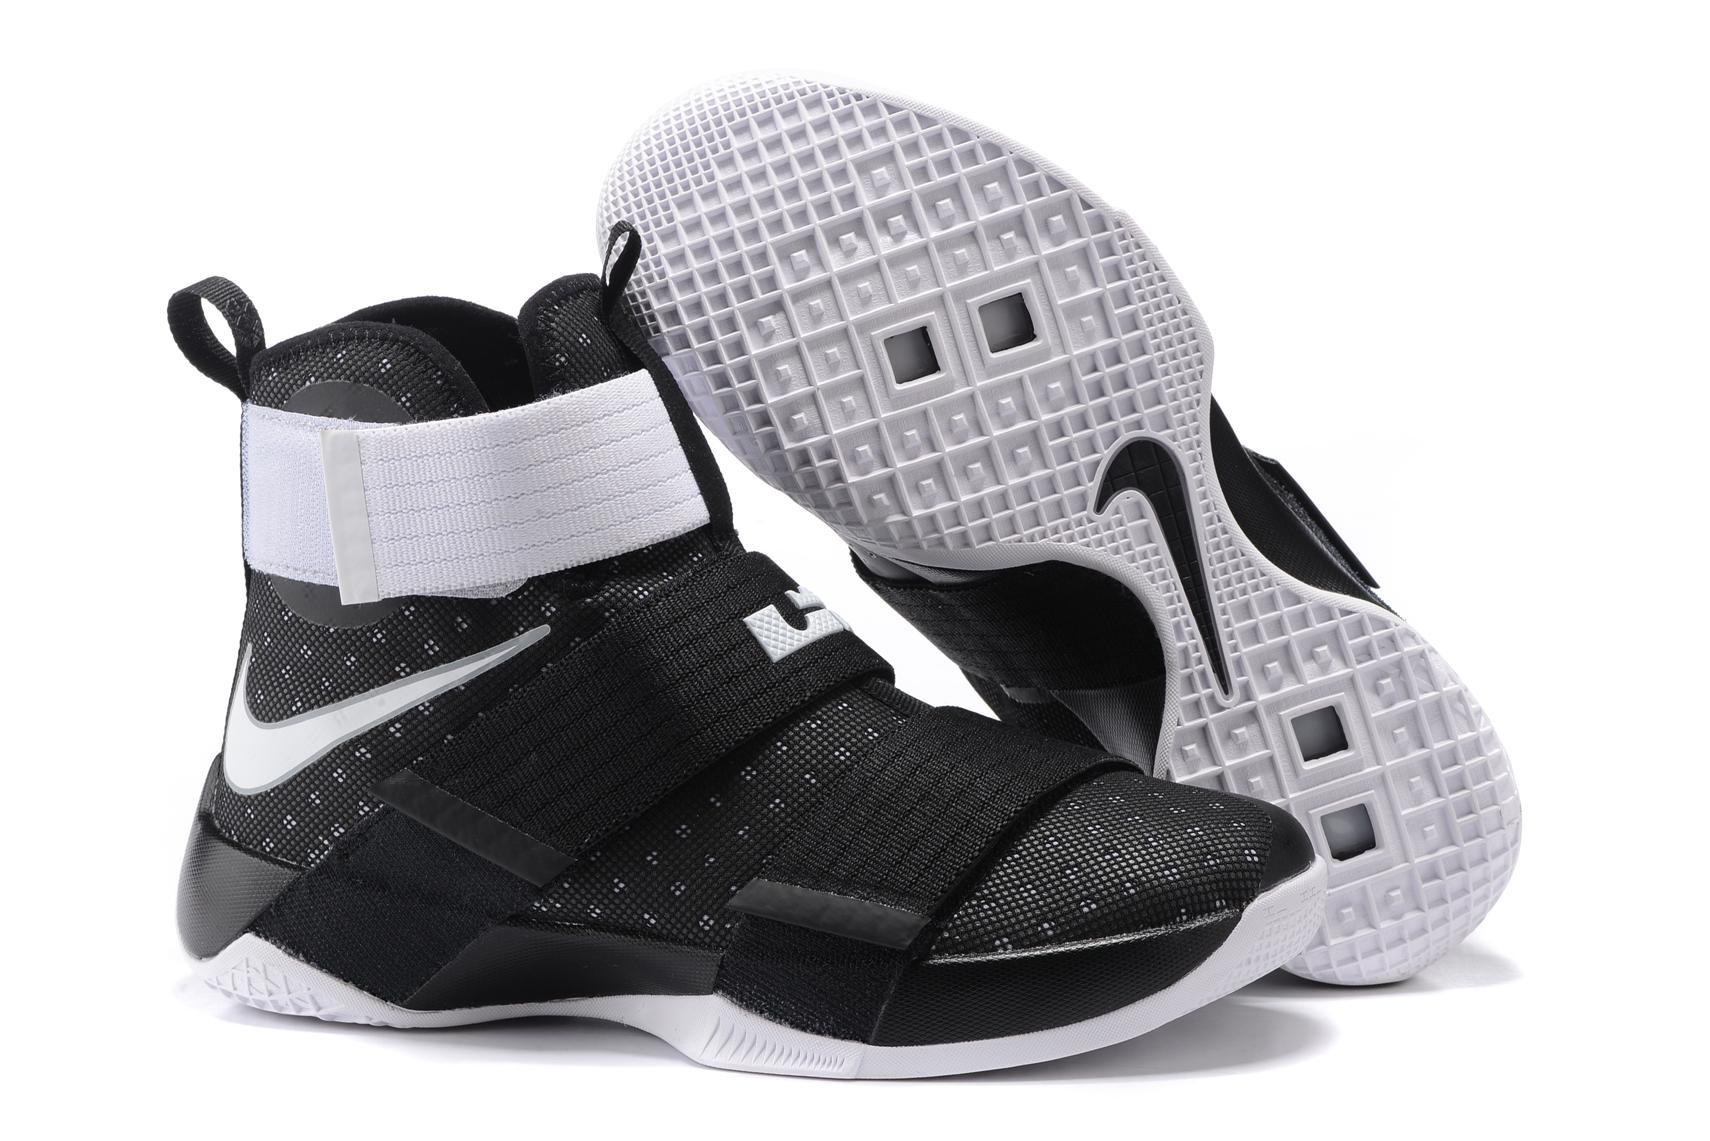 c5aaac4d5cb Prev Nike Lebron Soldier 10 EP X Men White Black Sliver Basketball Shoes  Men 844380-001